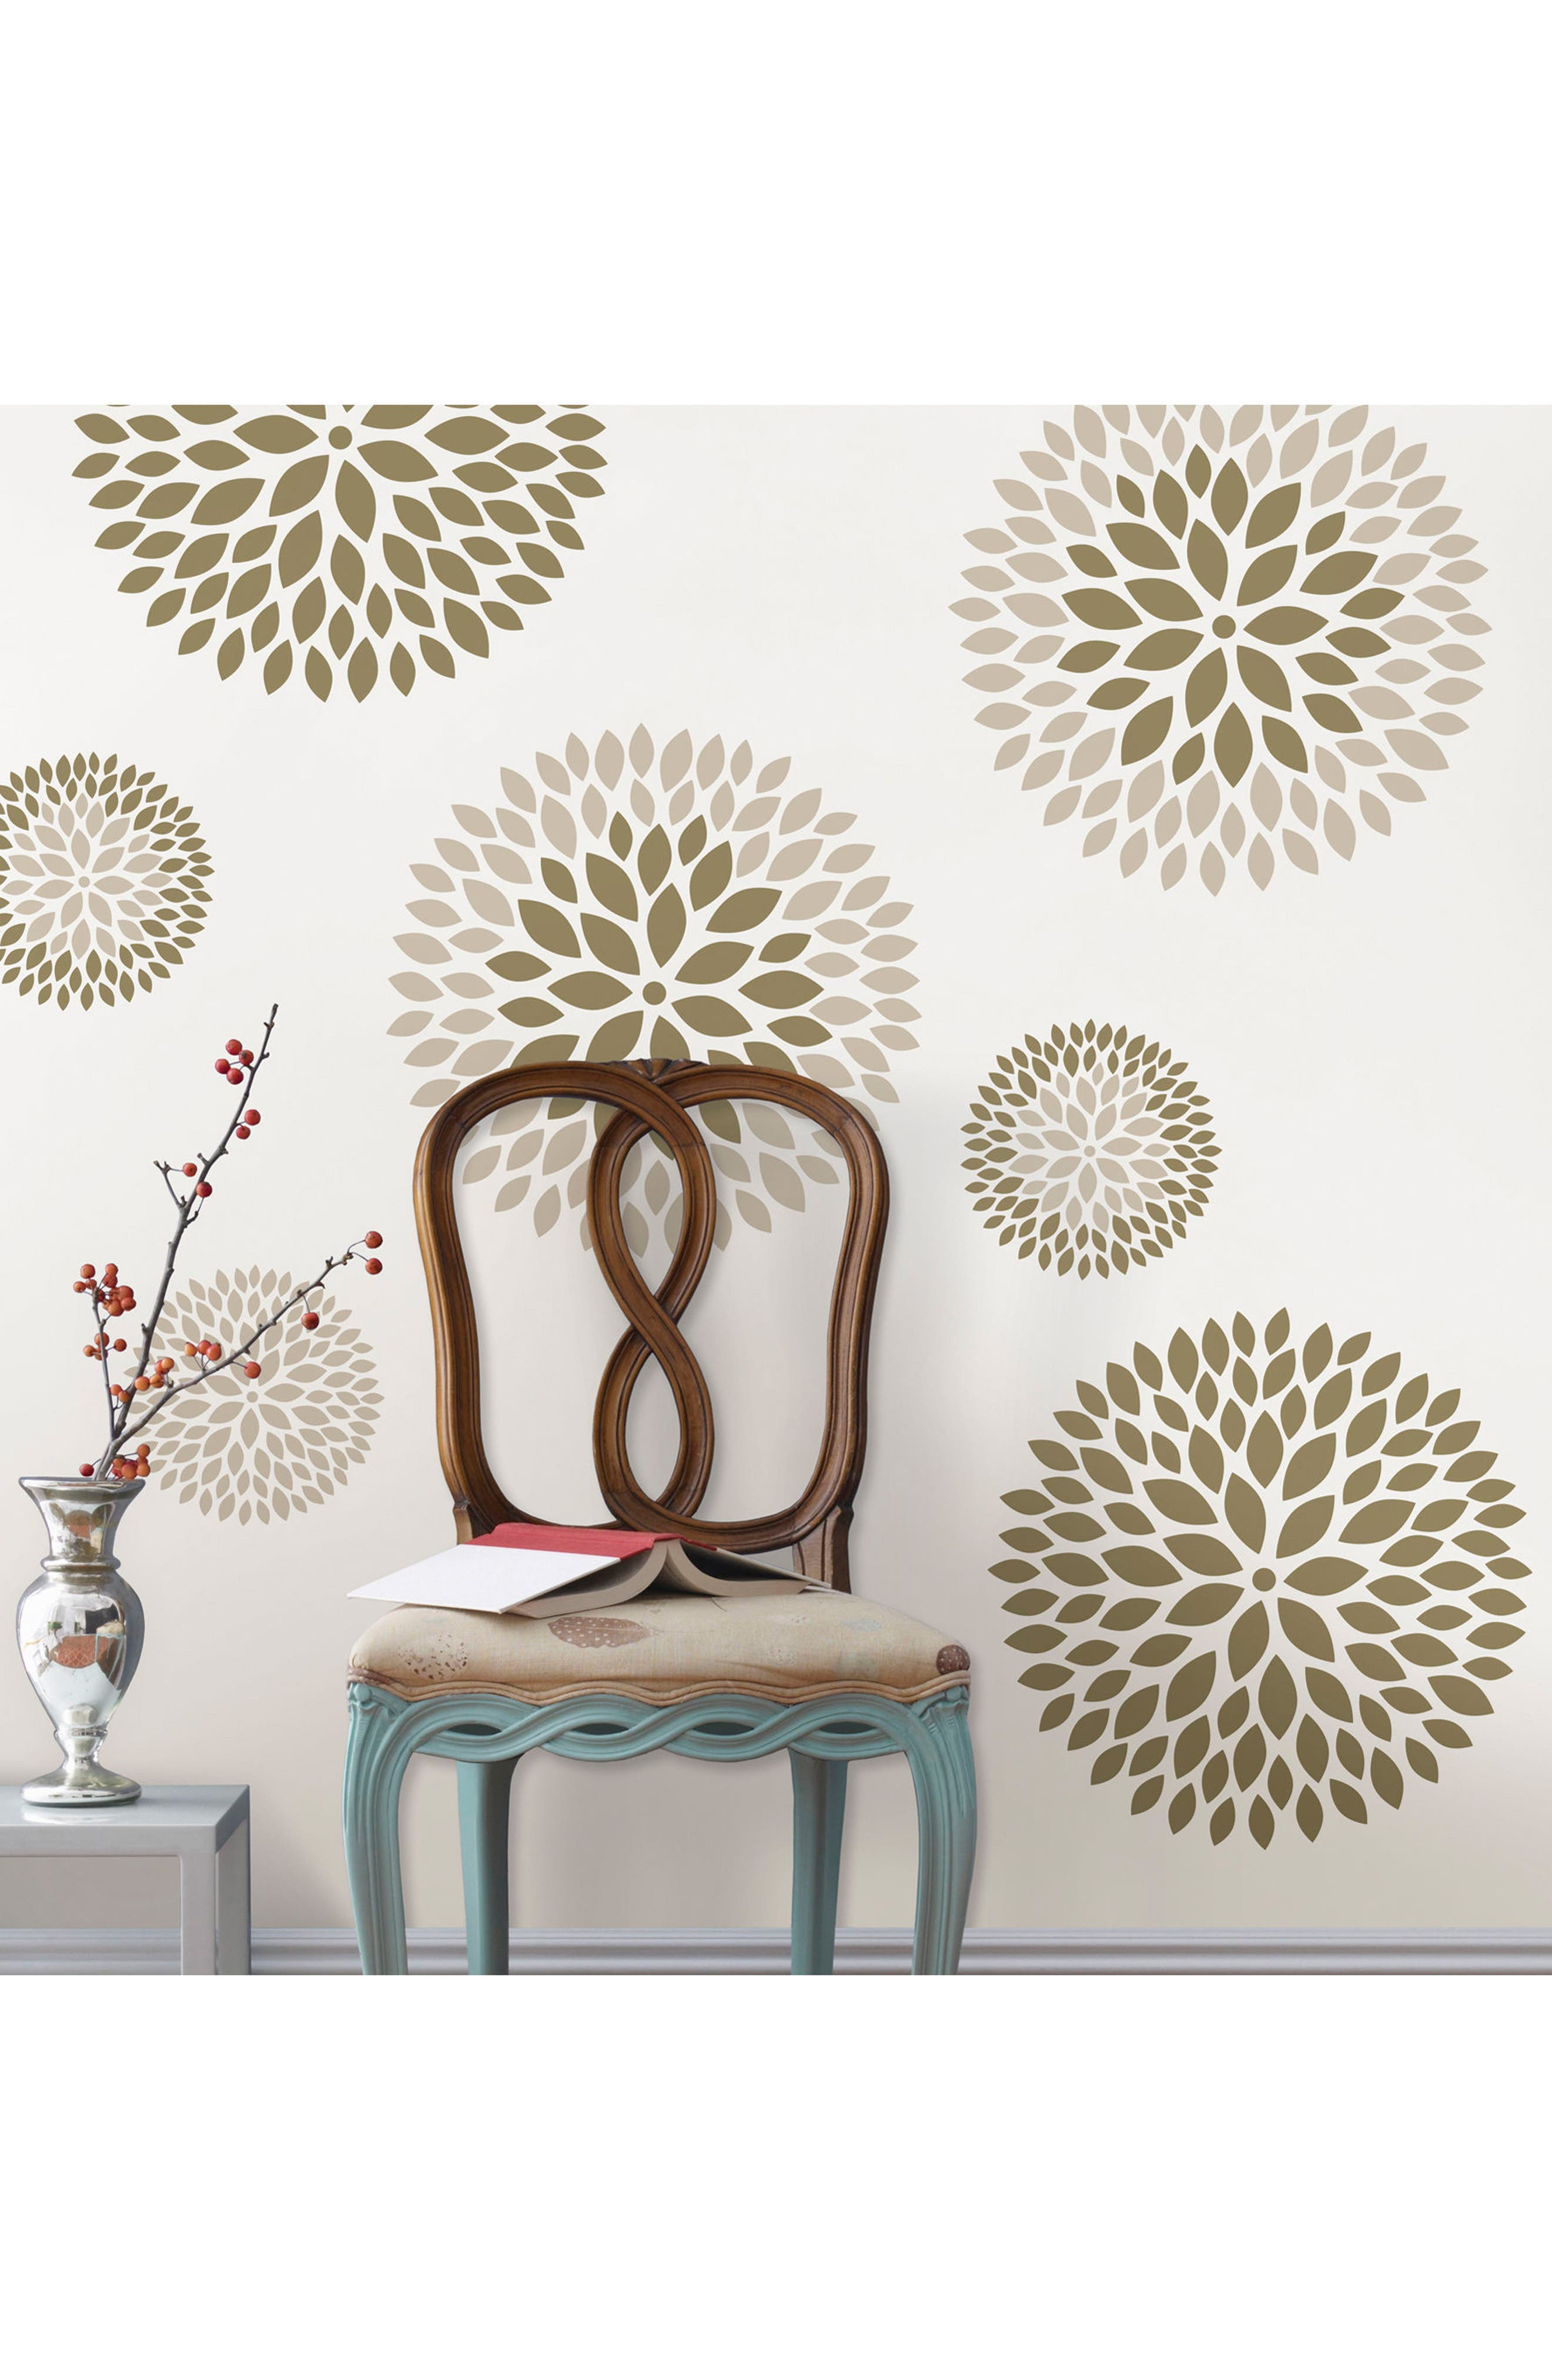 Chrysanthemum 8-Piece Wall Art Decal Set,                             Alternate thumbnail 3, color,                             250